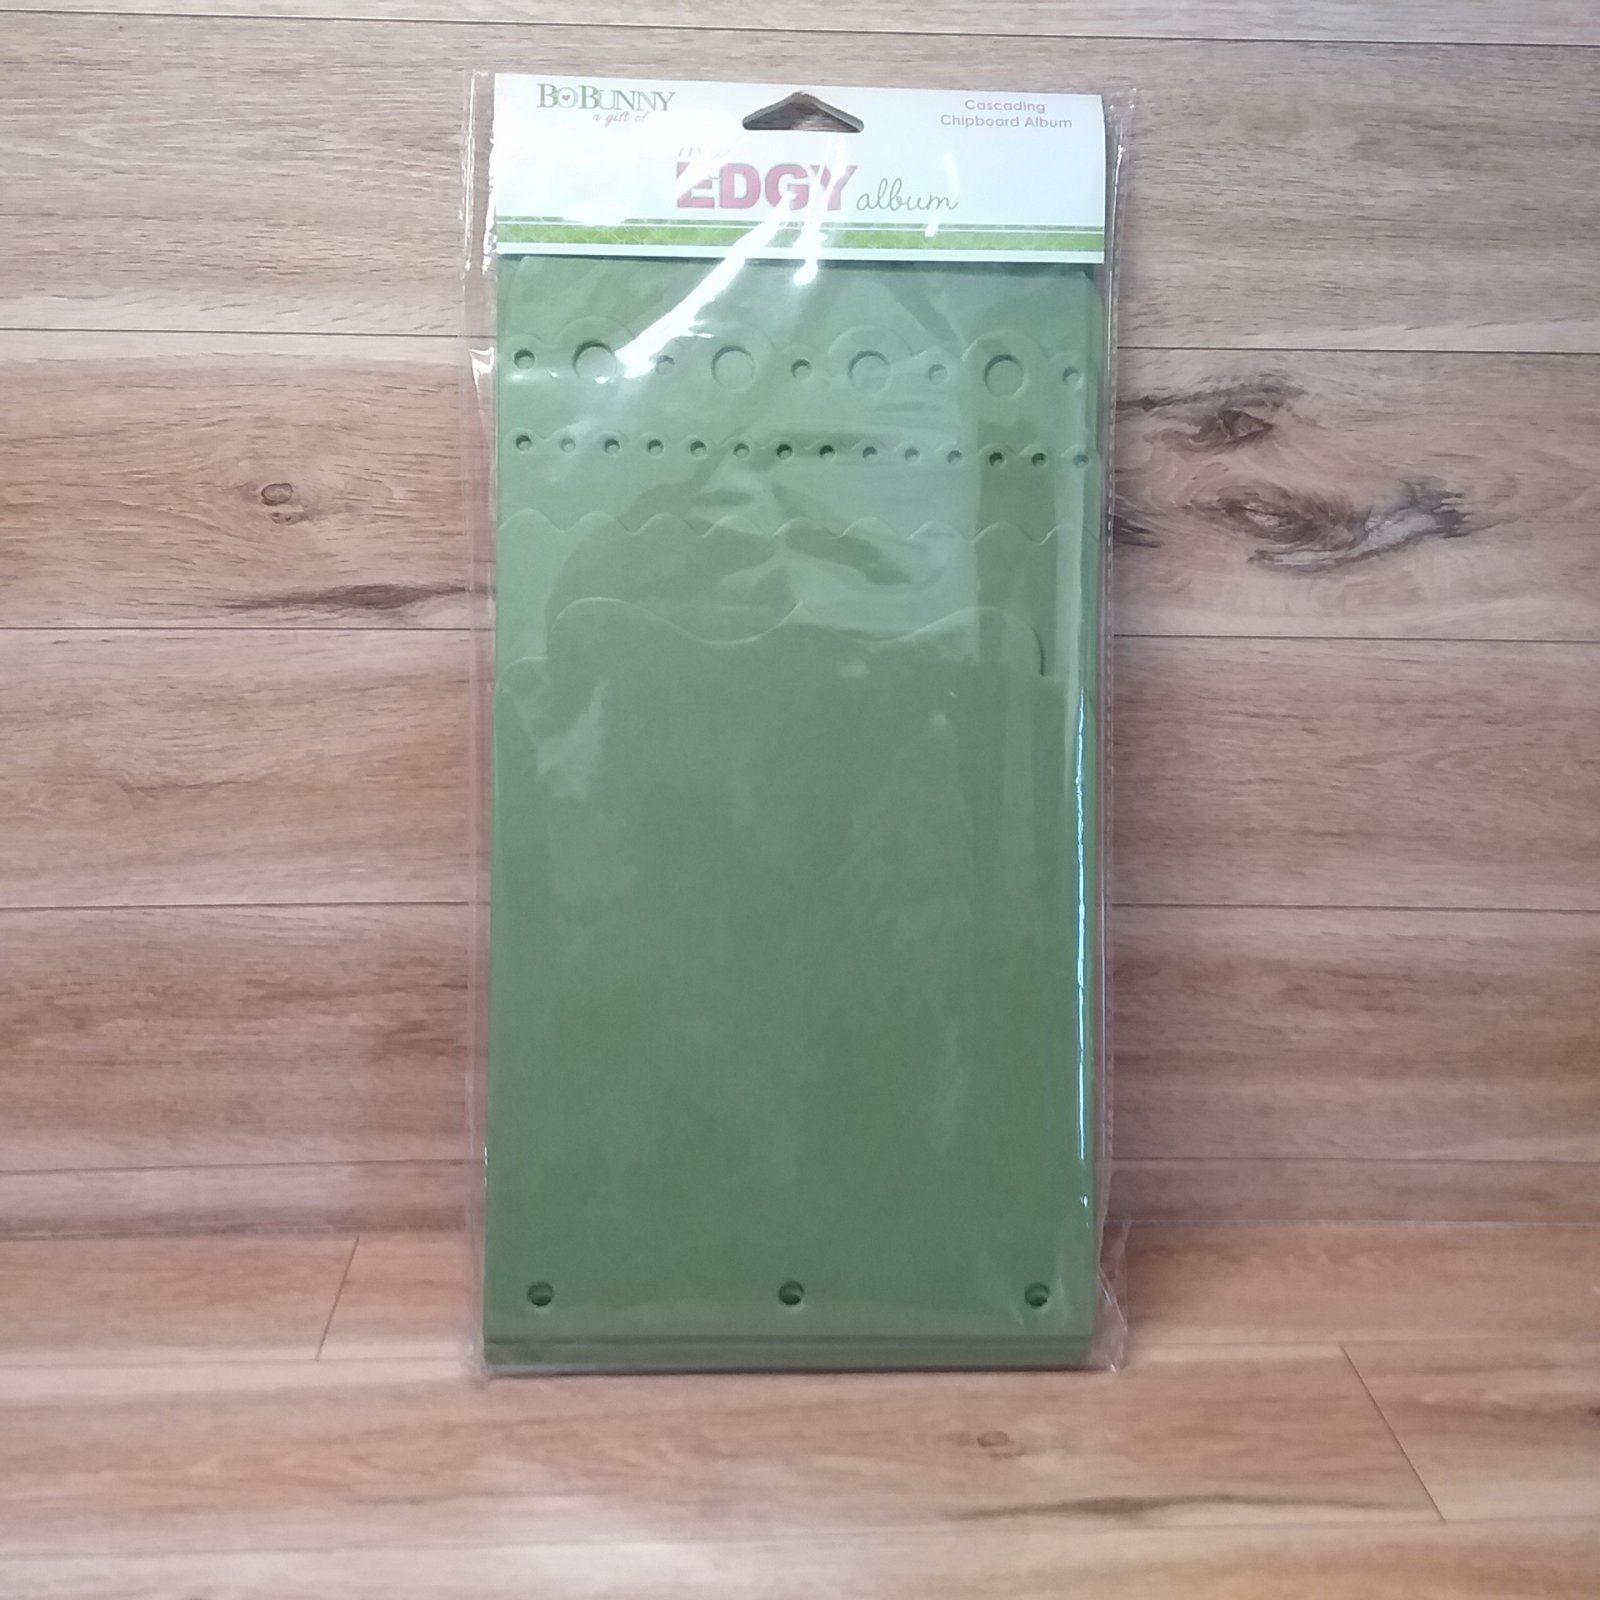 boBunny my edgy album - Green